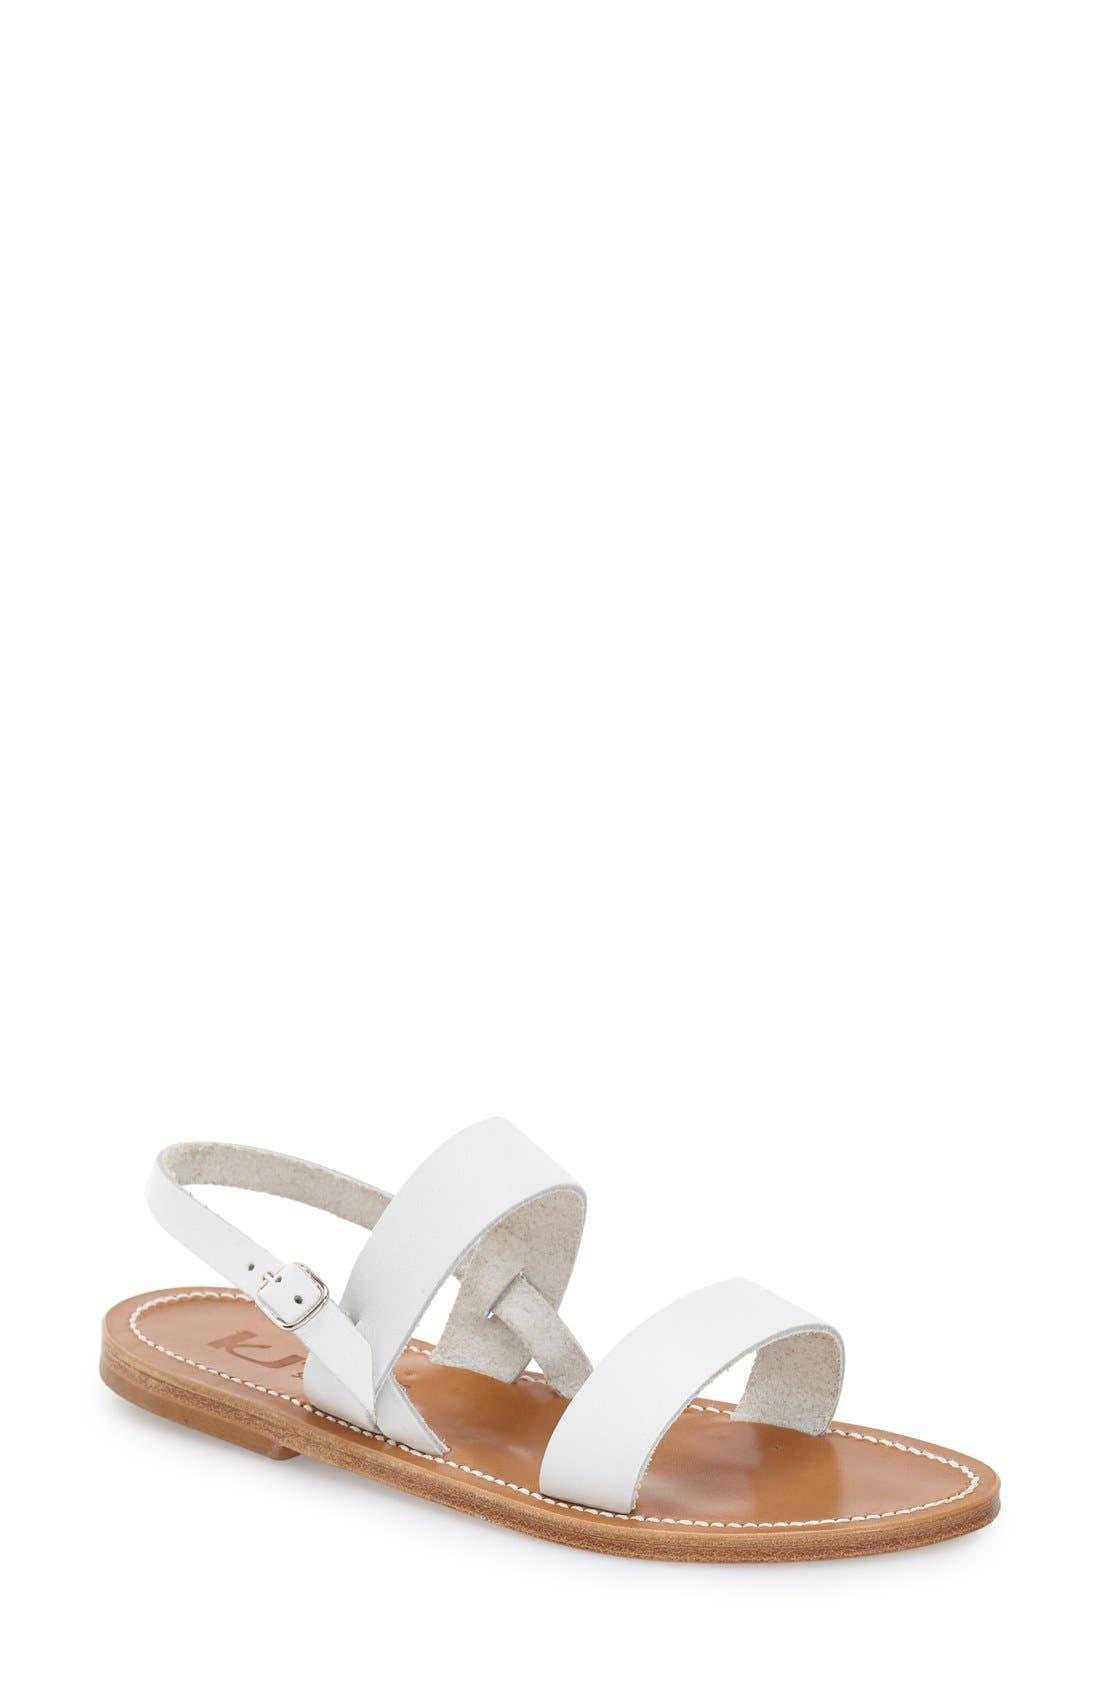 Main Image - K Jacques St. Tropez Flat 'Barigoule' Vachetta Leather Sandal